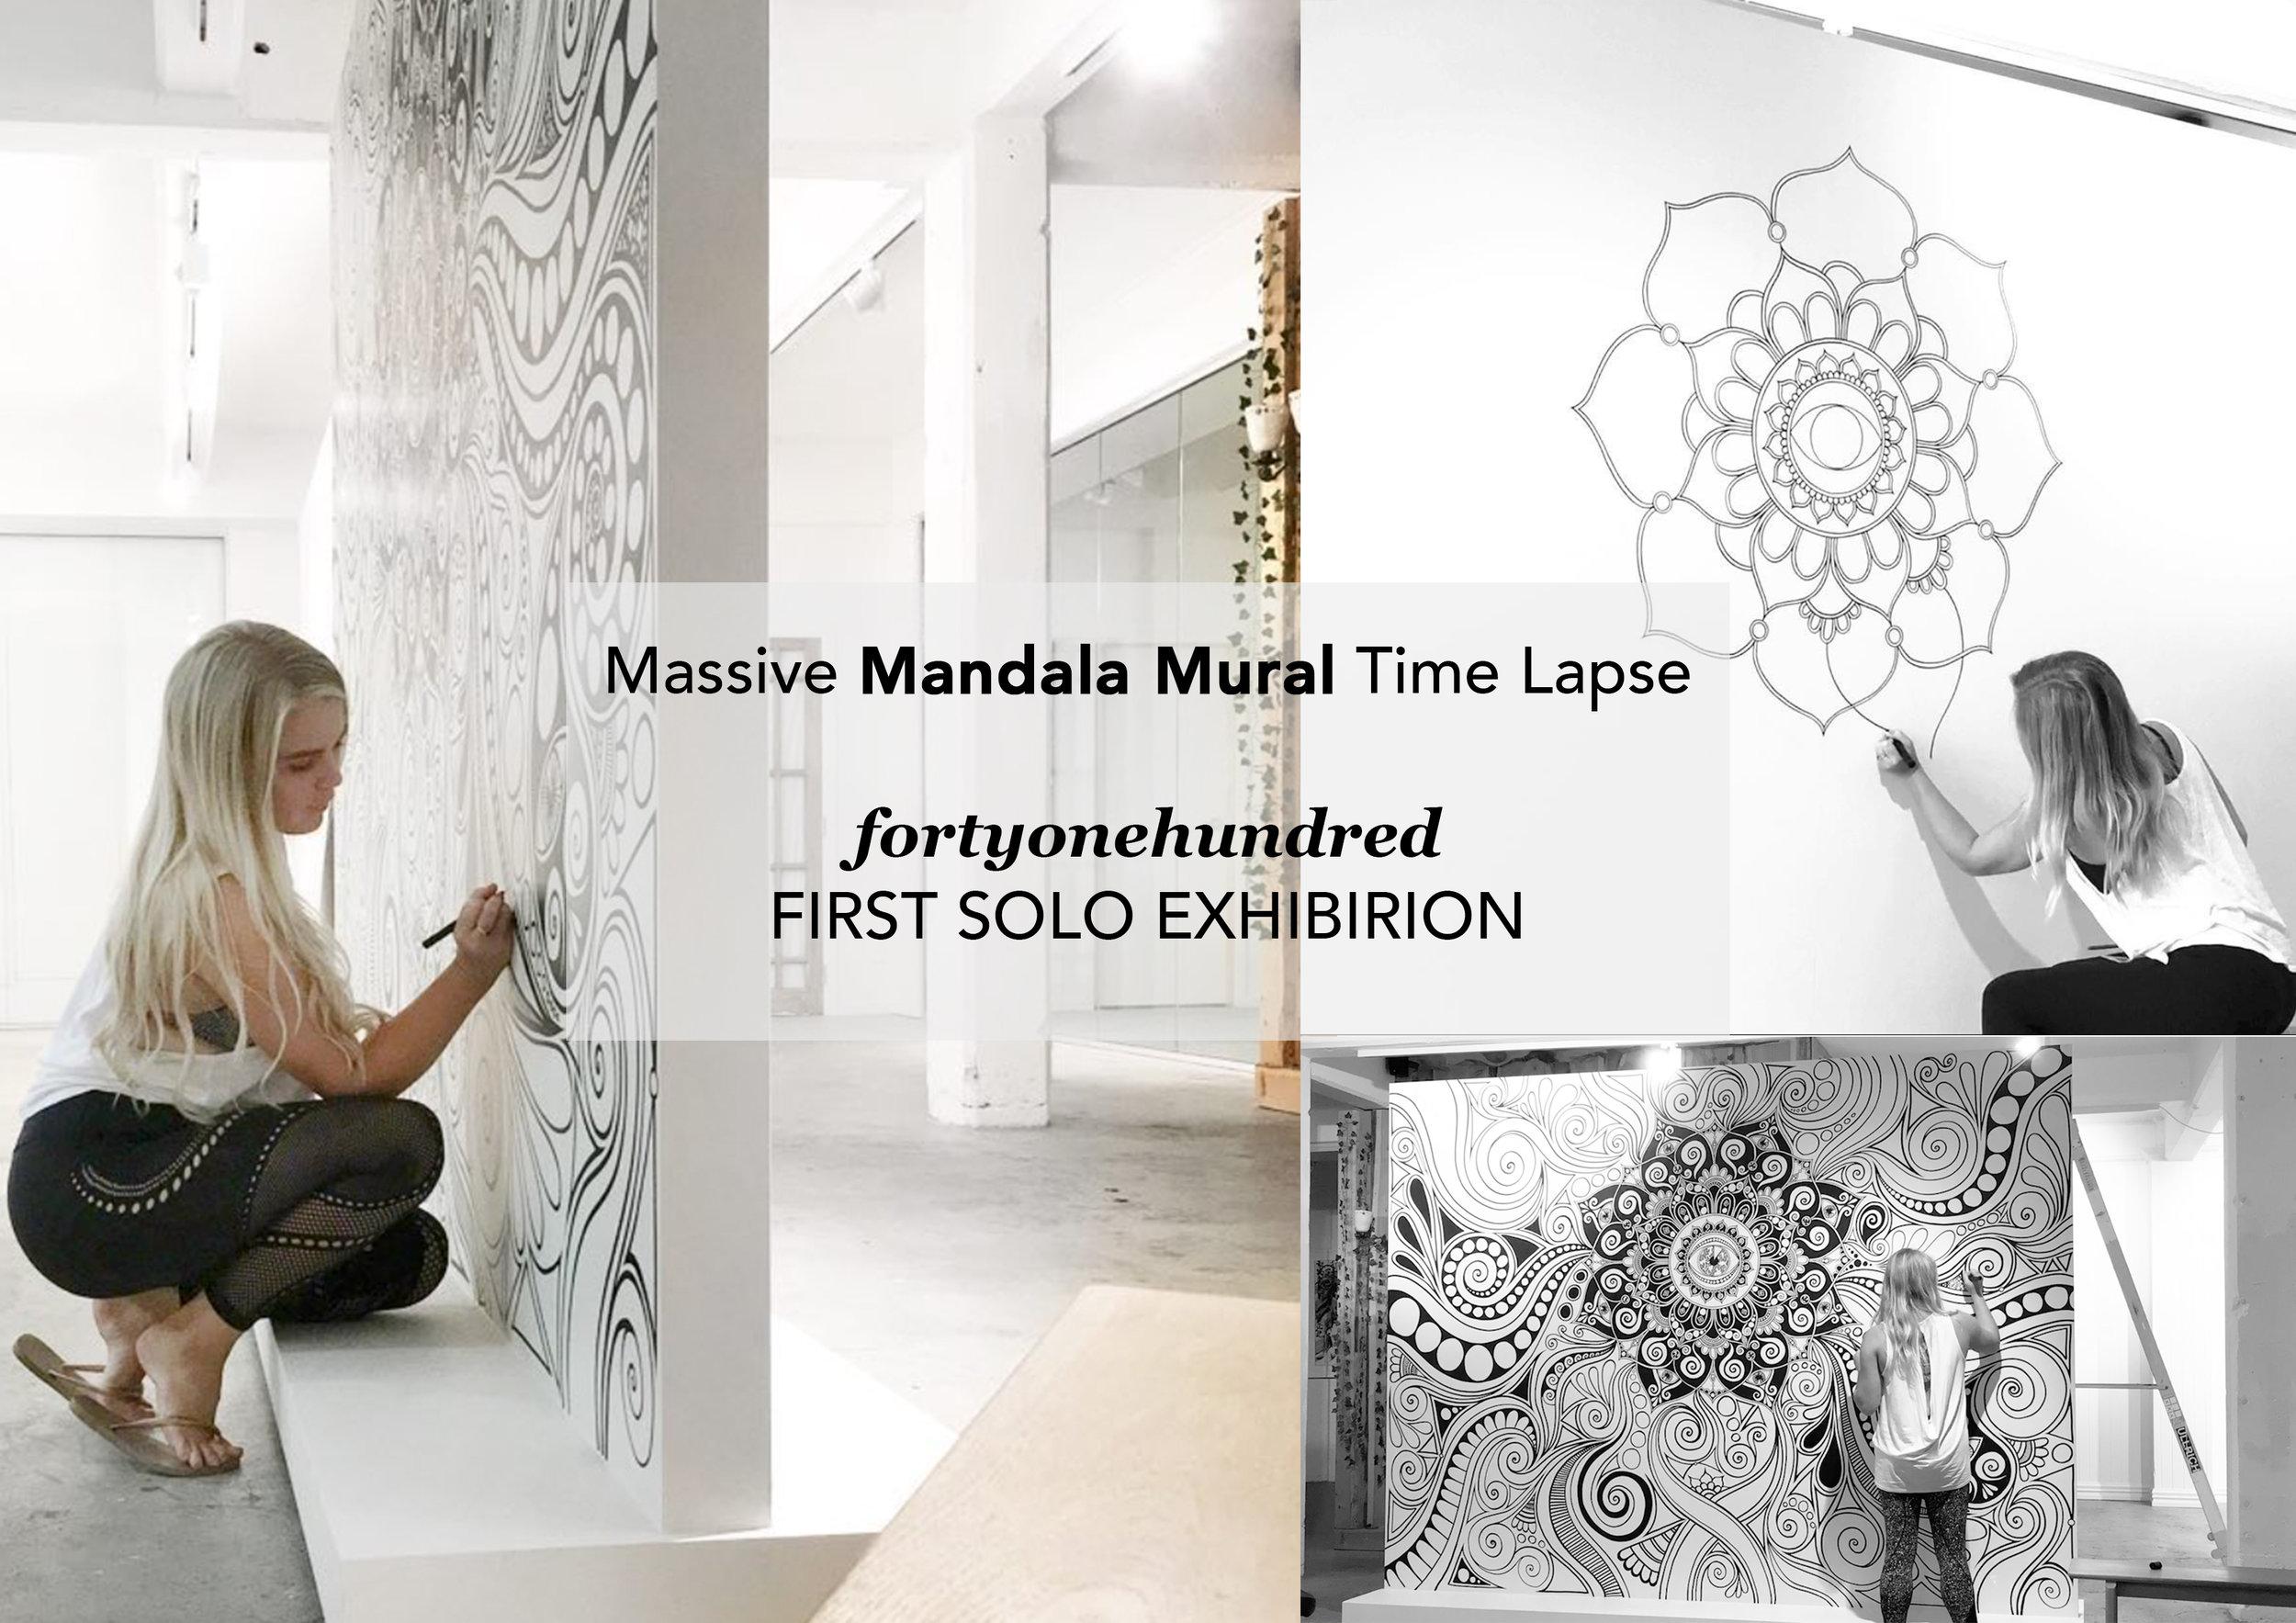 fortyonehundred-Mandala-Mural-Art-TimeLapse-NZ-Artist-NewZealandArtist-MandalaMural-Youtube.jpeg